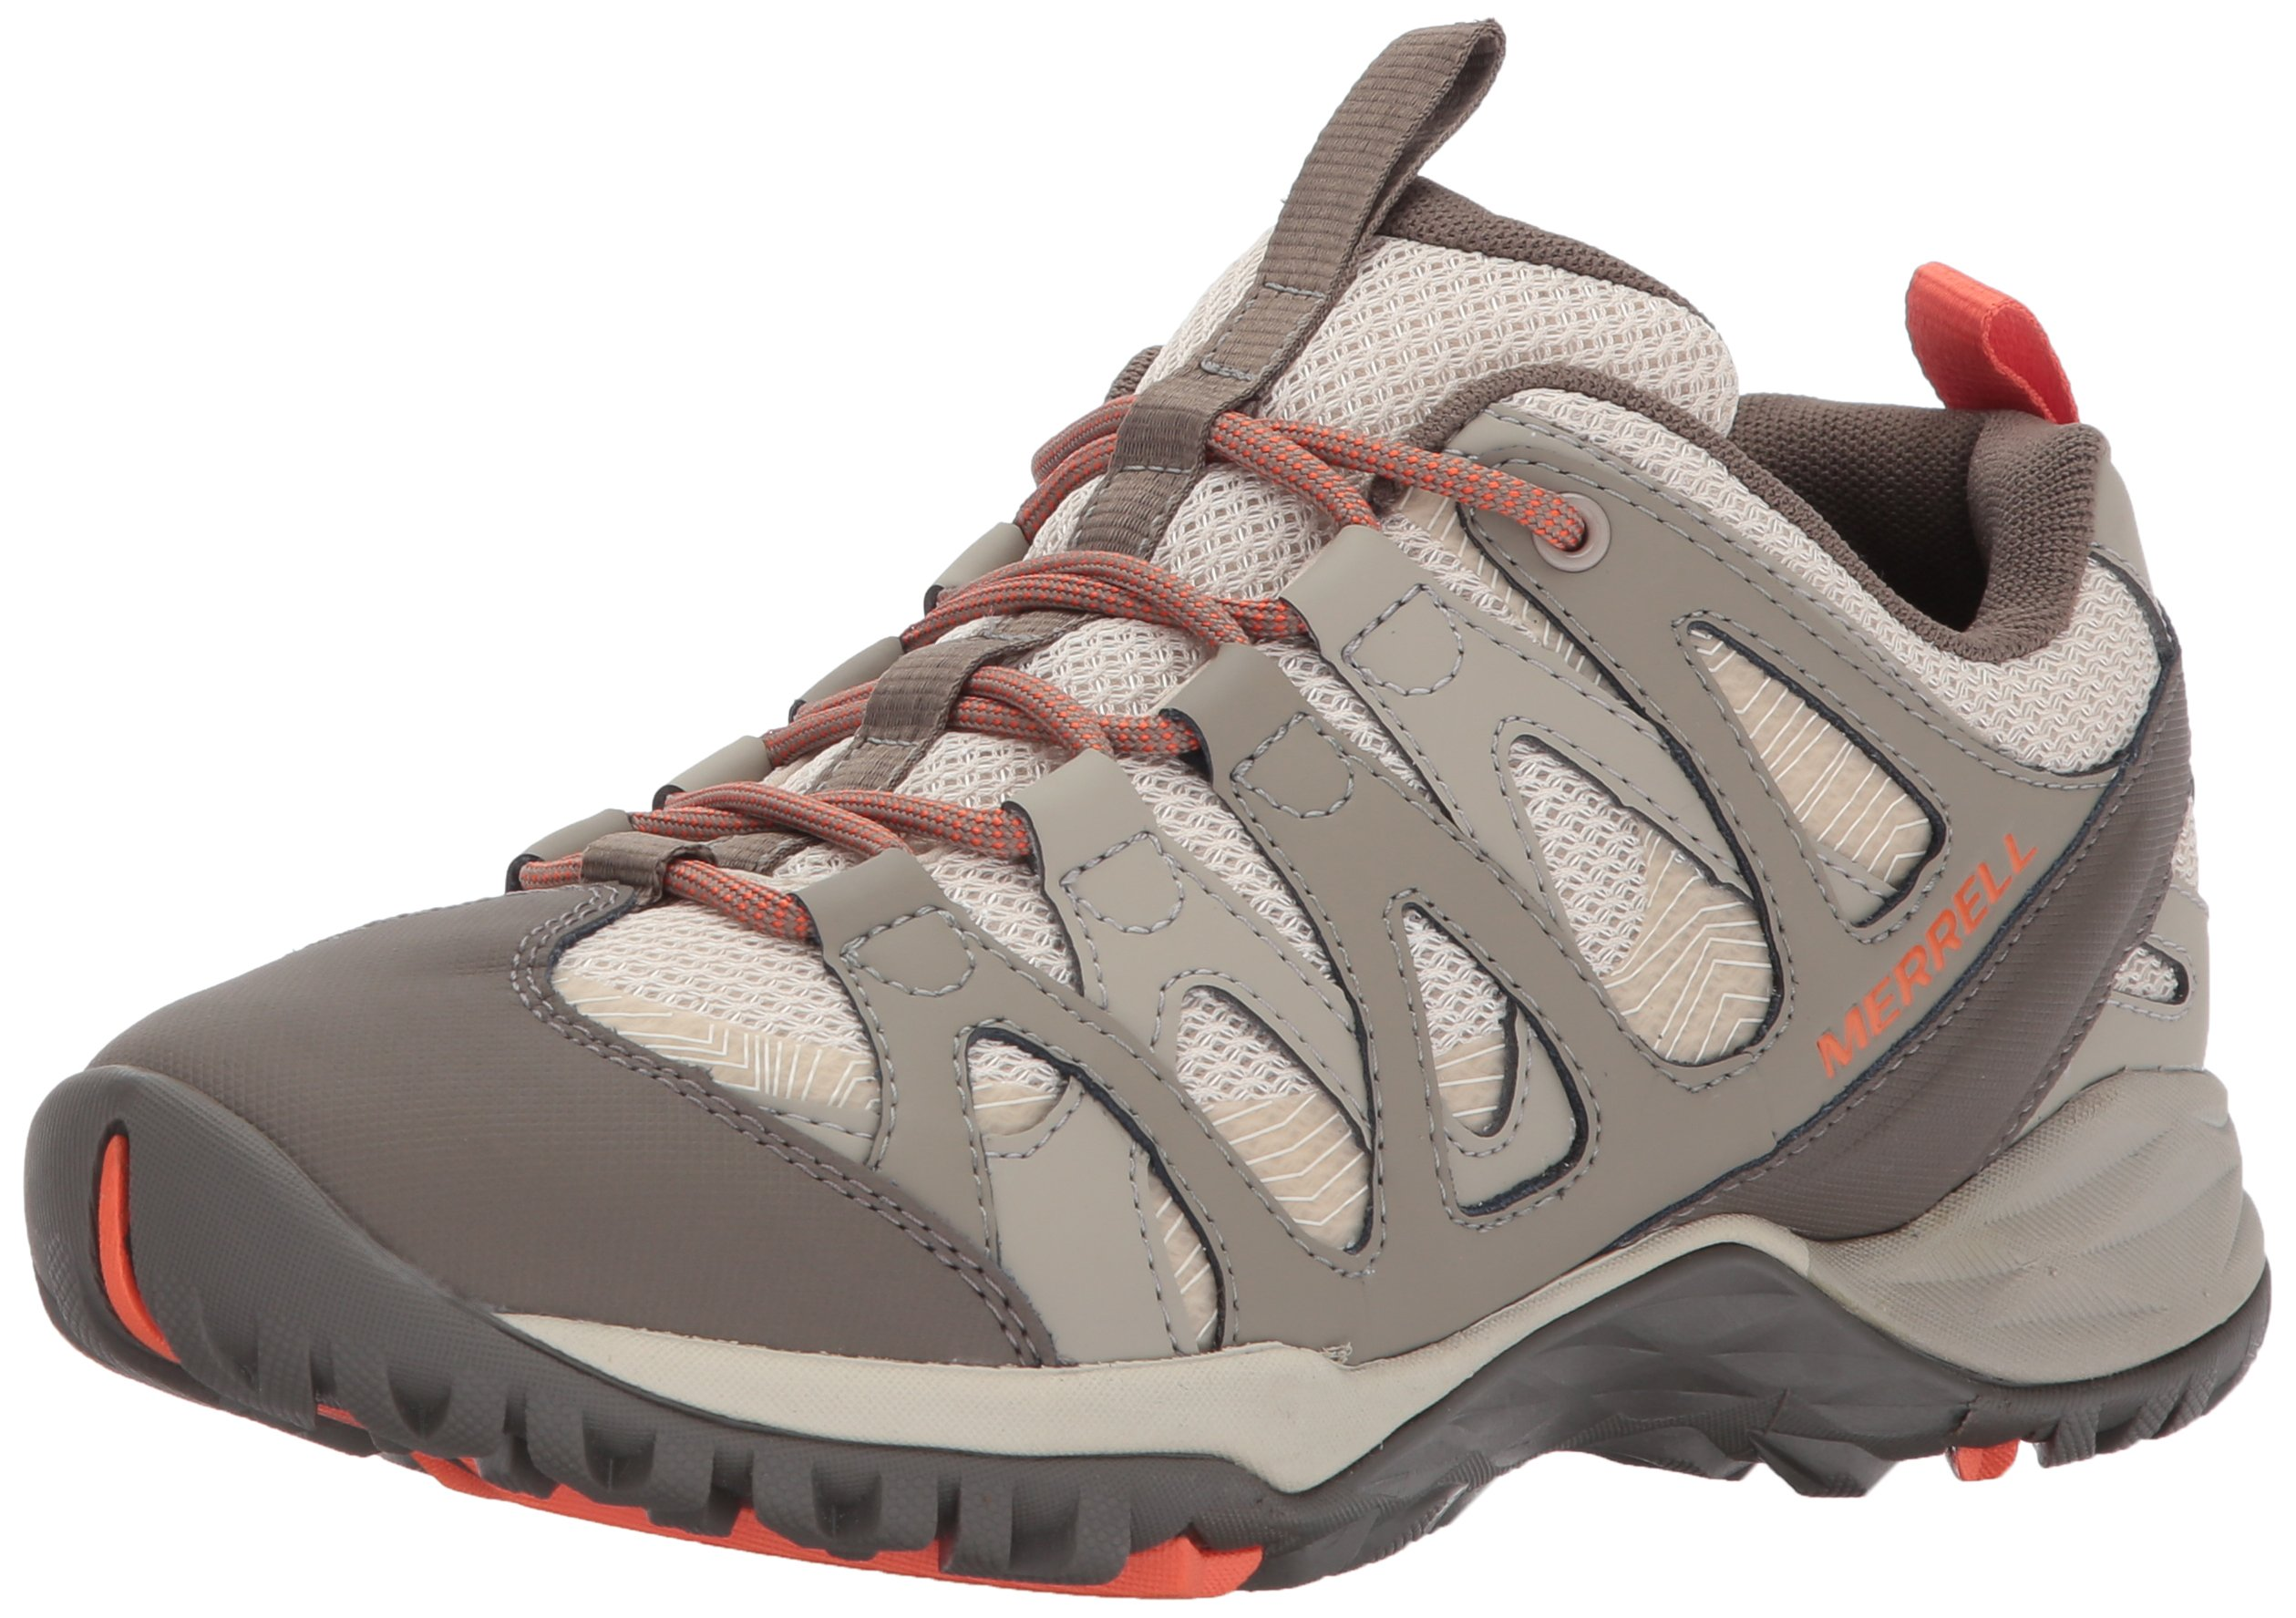 Merrell Women's Siren Hex Hiking Shoe, Oyster Grey, 8.5 M US